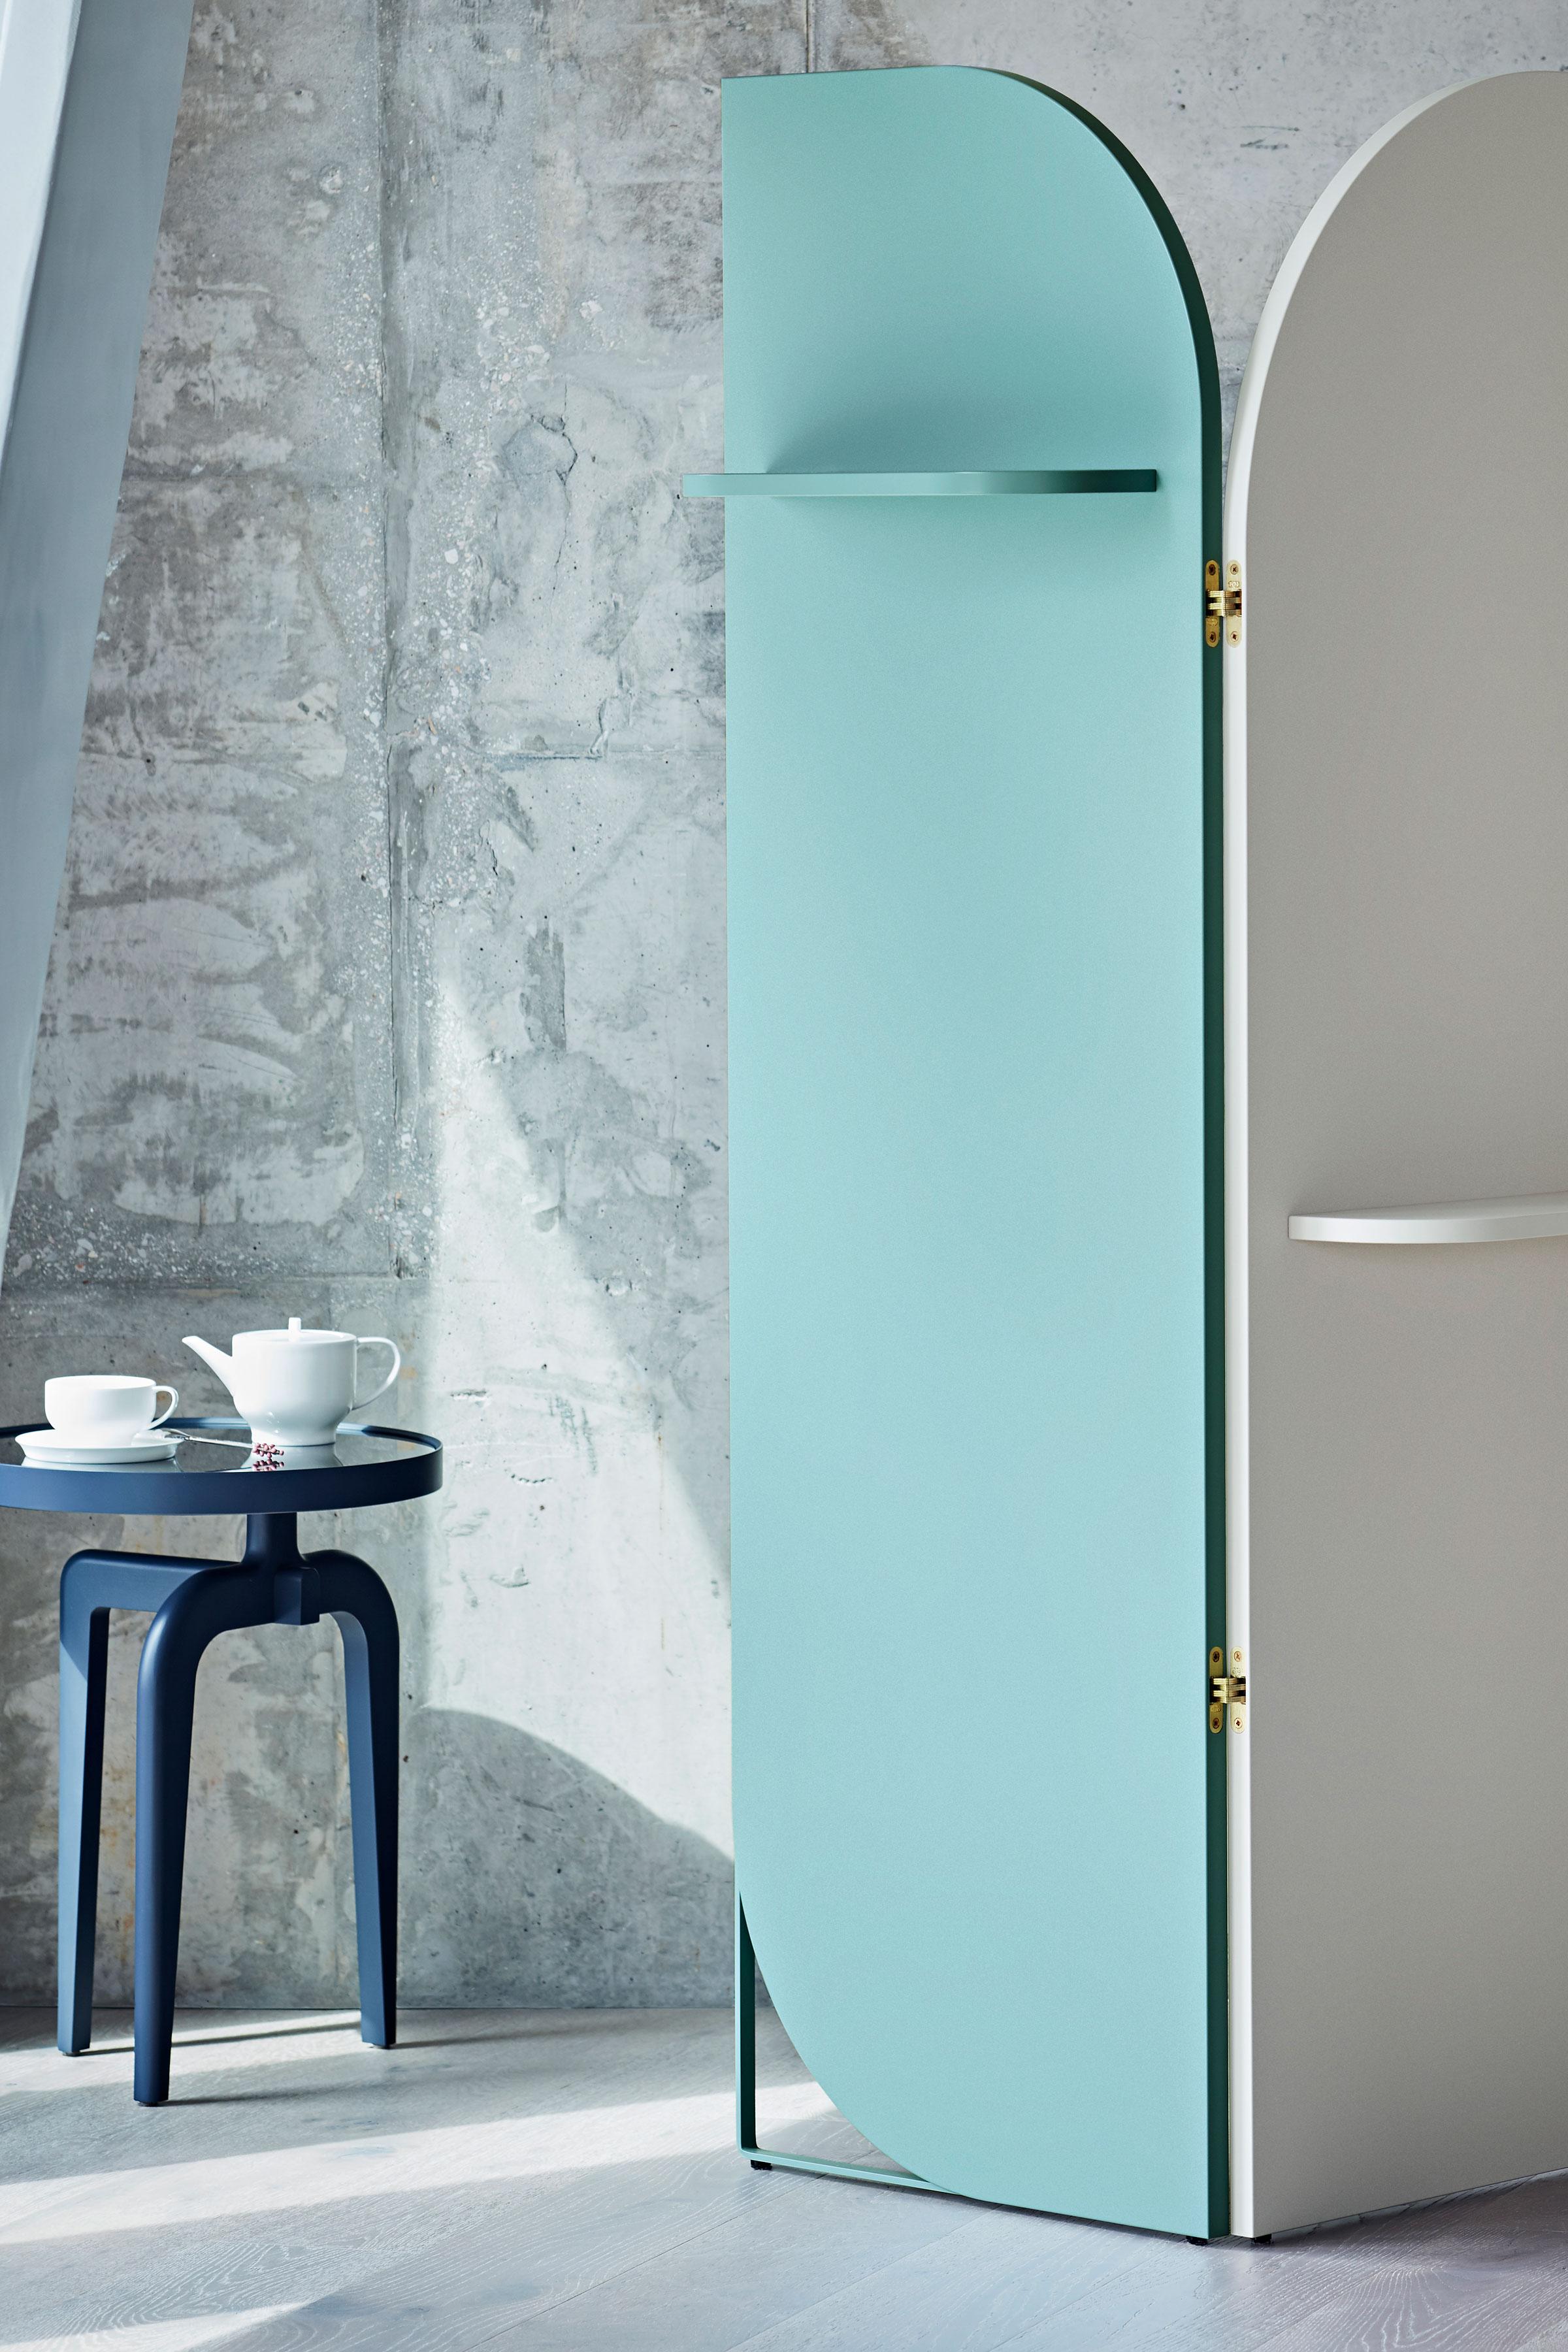 Lola Paravant Deisgn by London Design Studio Bodo Sperlein